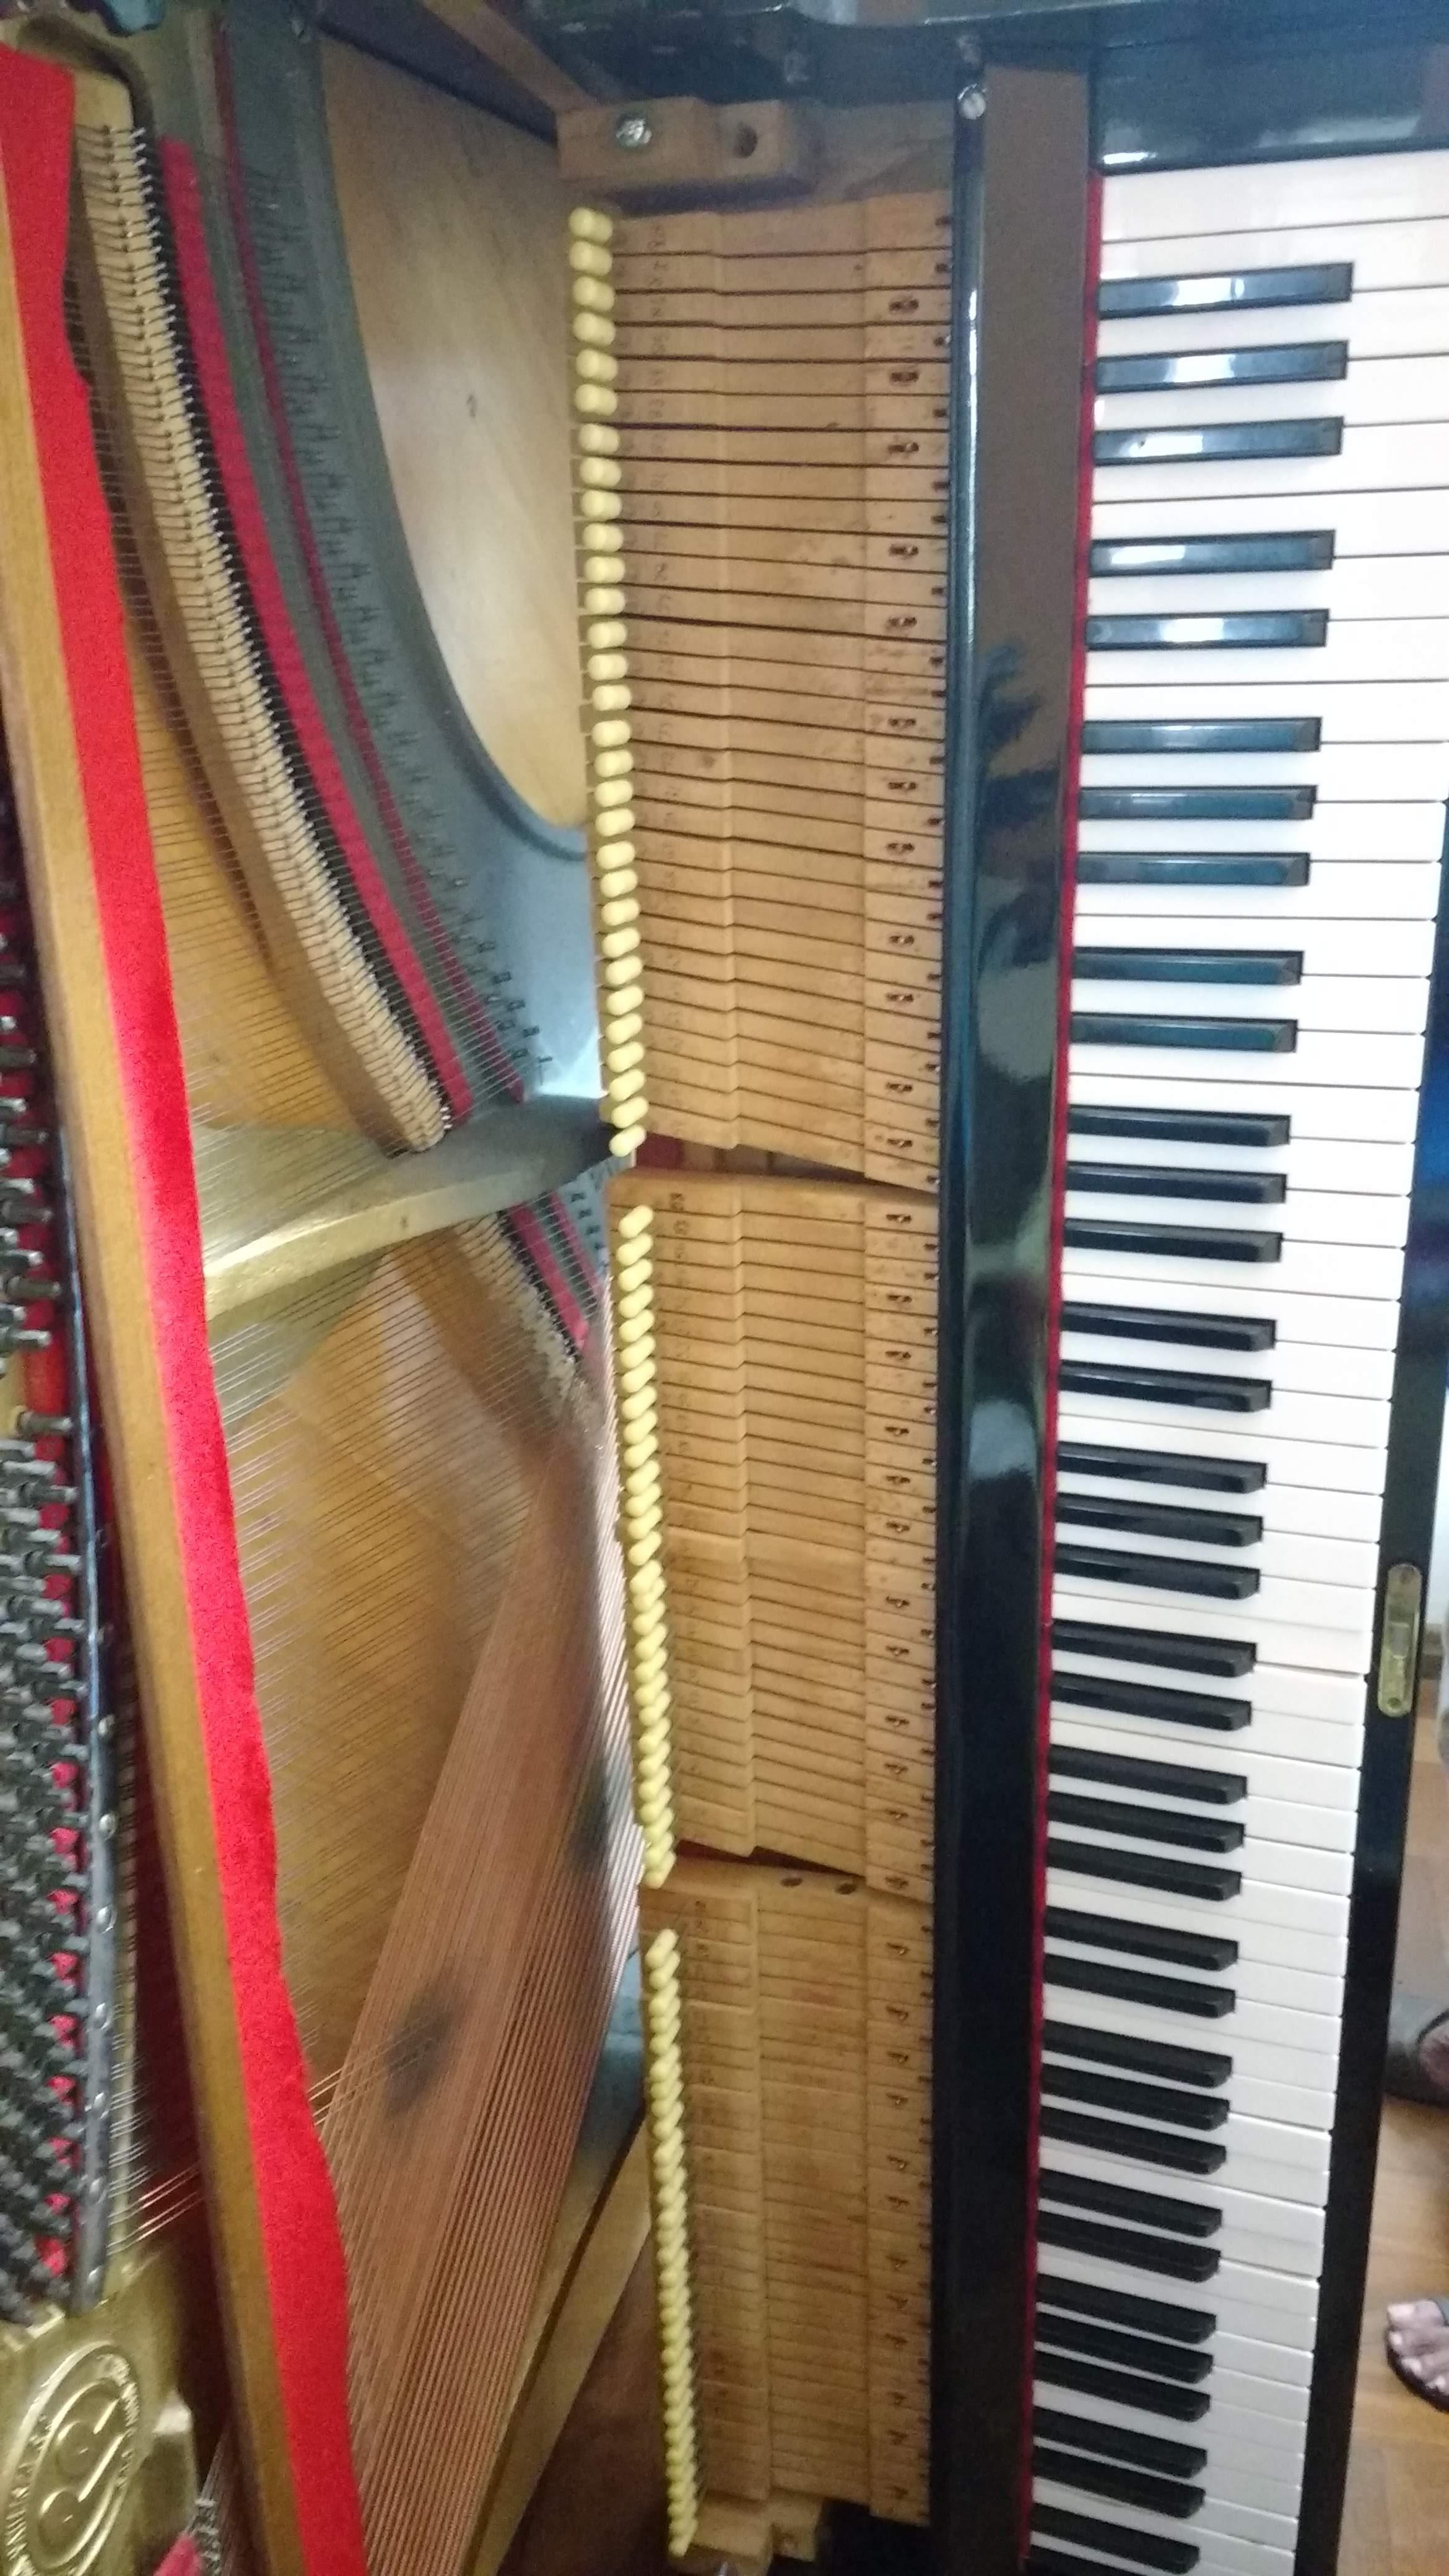 aulas de musica jf contato escola de musica luciane borges professora de teclado 32-3223-8063 @lucianetecladista